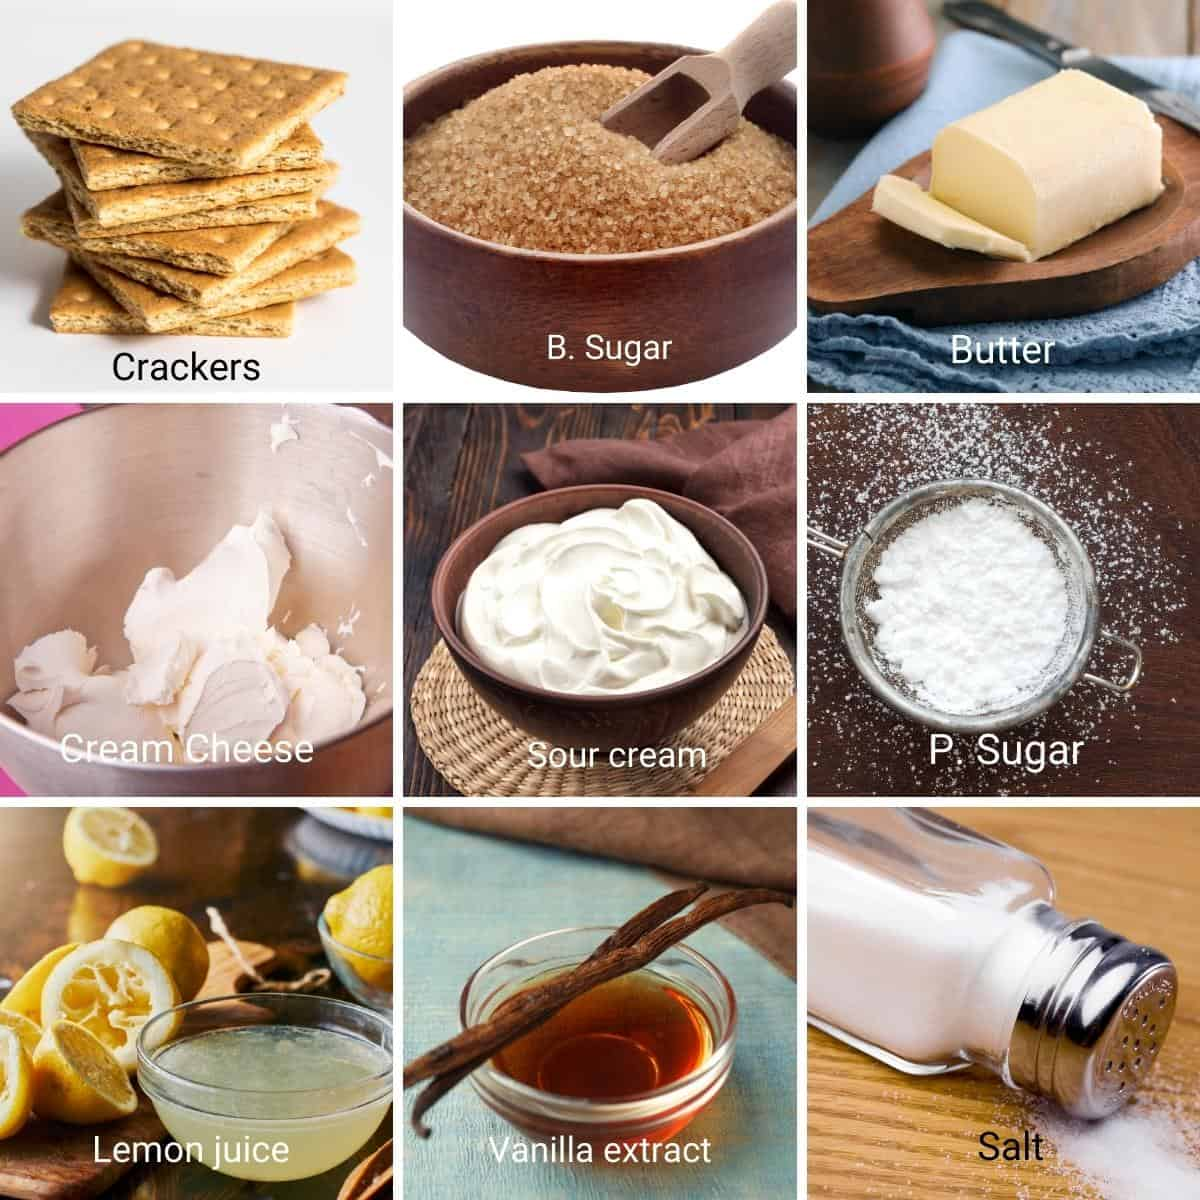 Ingredients shots for Frozen ice cream cheesecake.